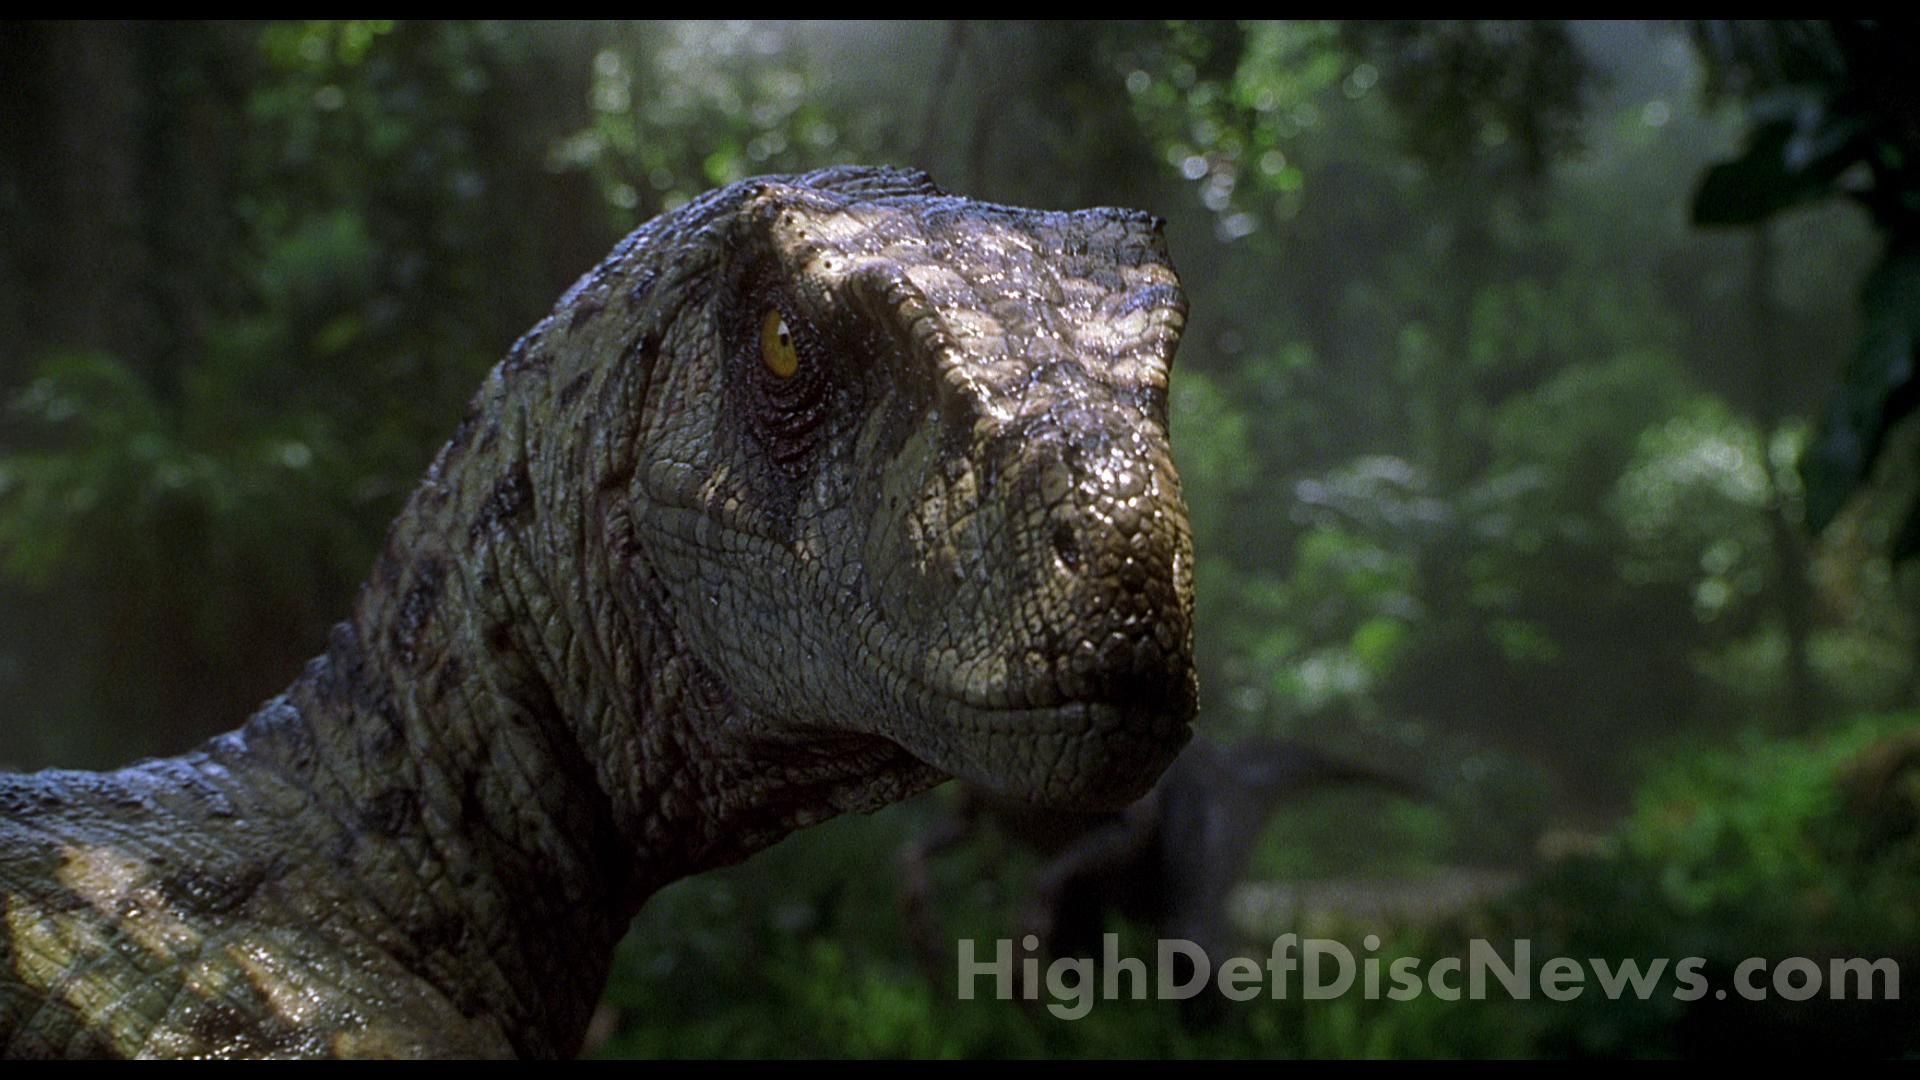 Jurassic Park Spinosaurus Wallpaper Best Cool Wallpaper Hd Hd